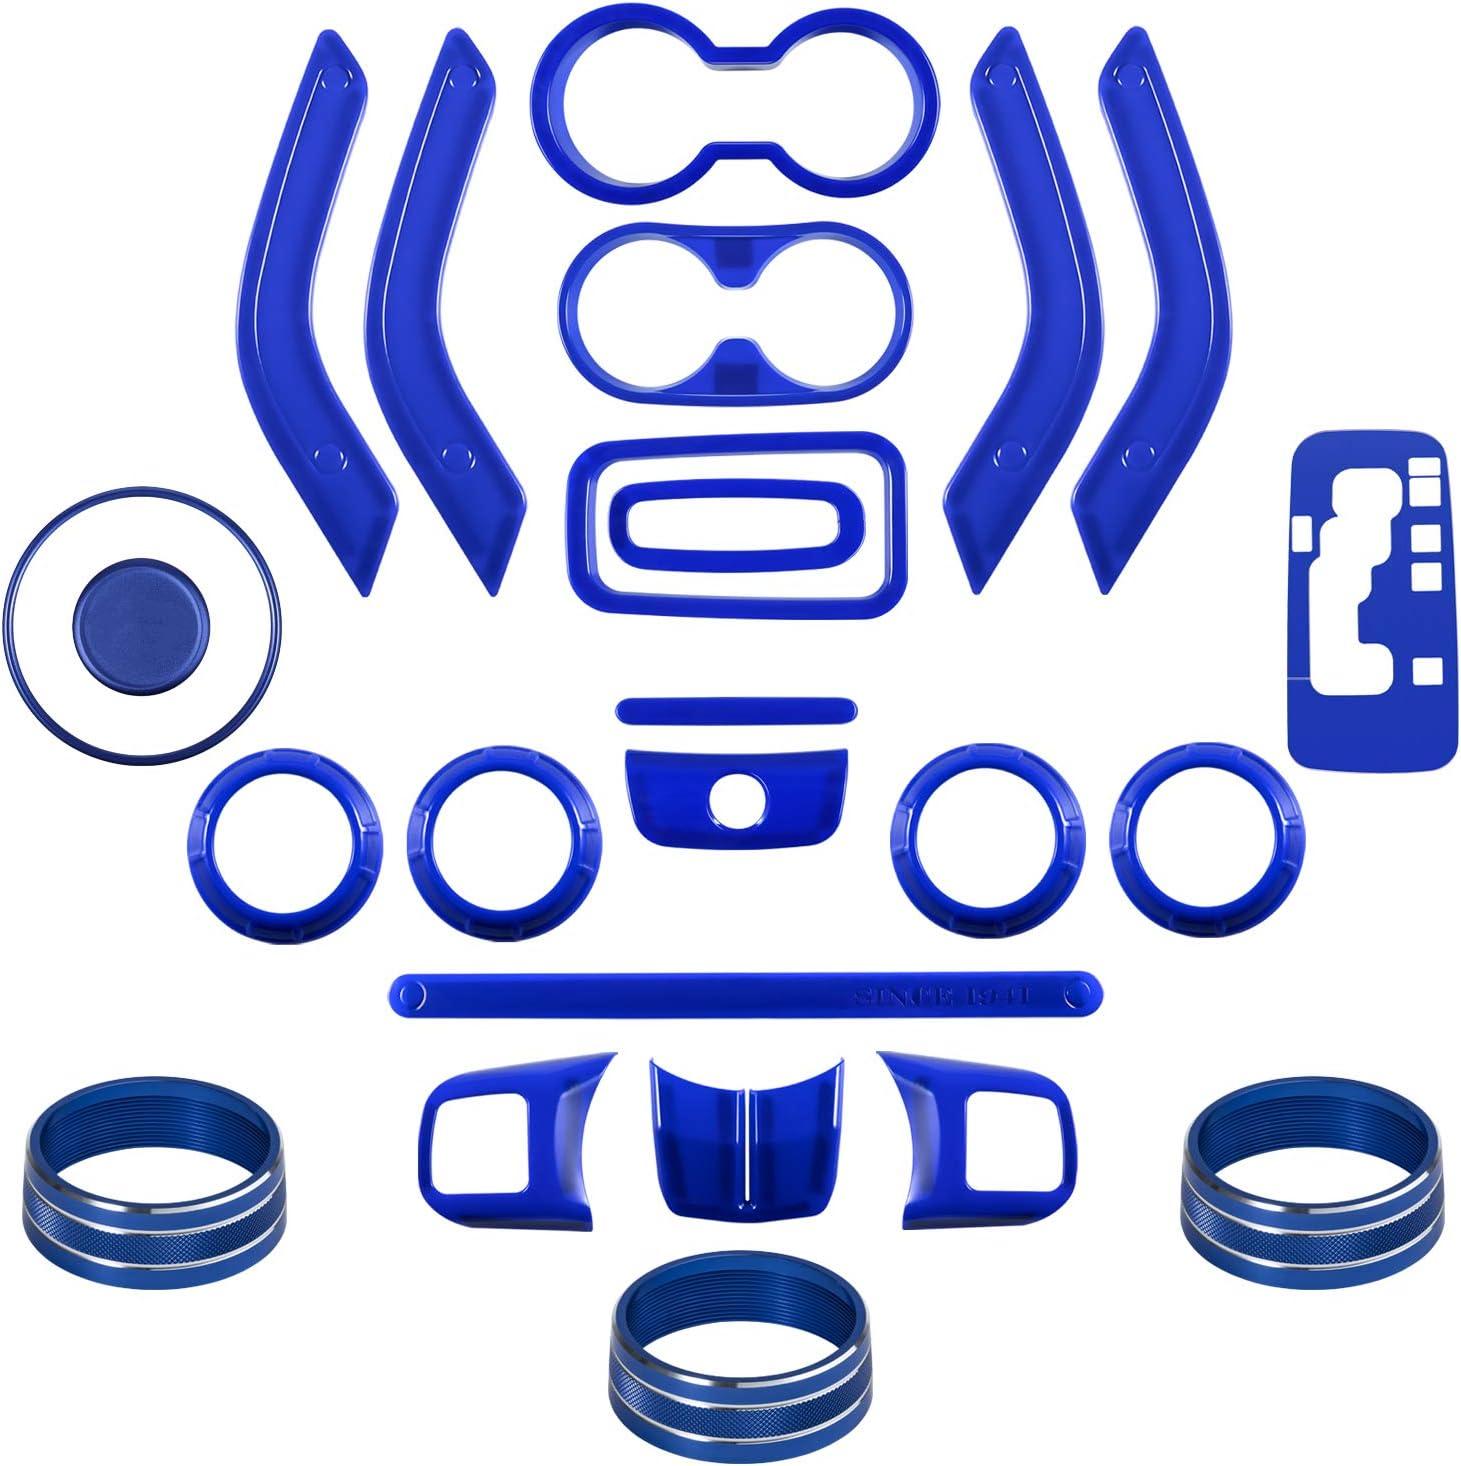 26 PCS Interior Decoration Trim Kit Purple Steering Wheel/&Center Console Cover Door Handle Cover Inner,Gear Frame,Copilot Handle Trim For Jeep Wrangler JK JKU 2011-2018 2/&4-Door Air Outlet Trim